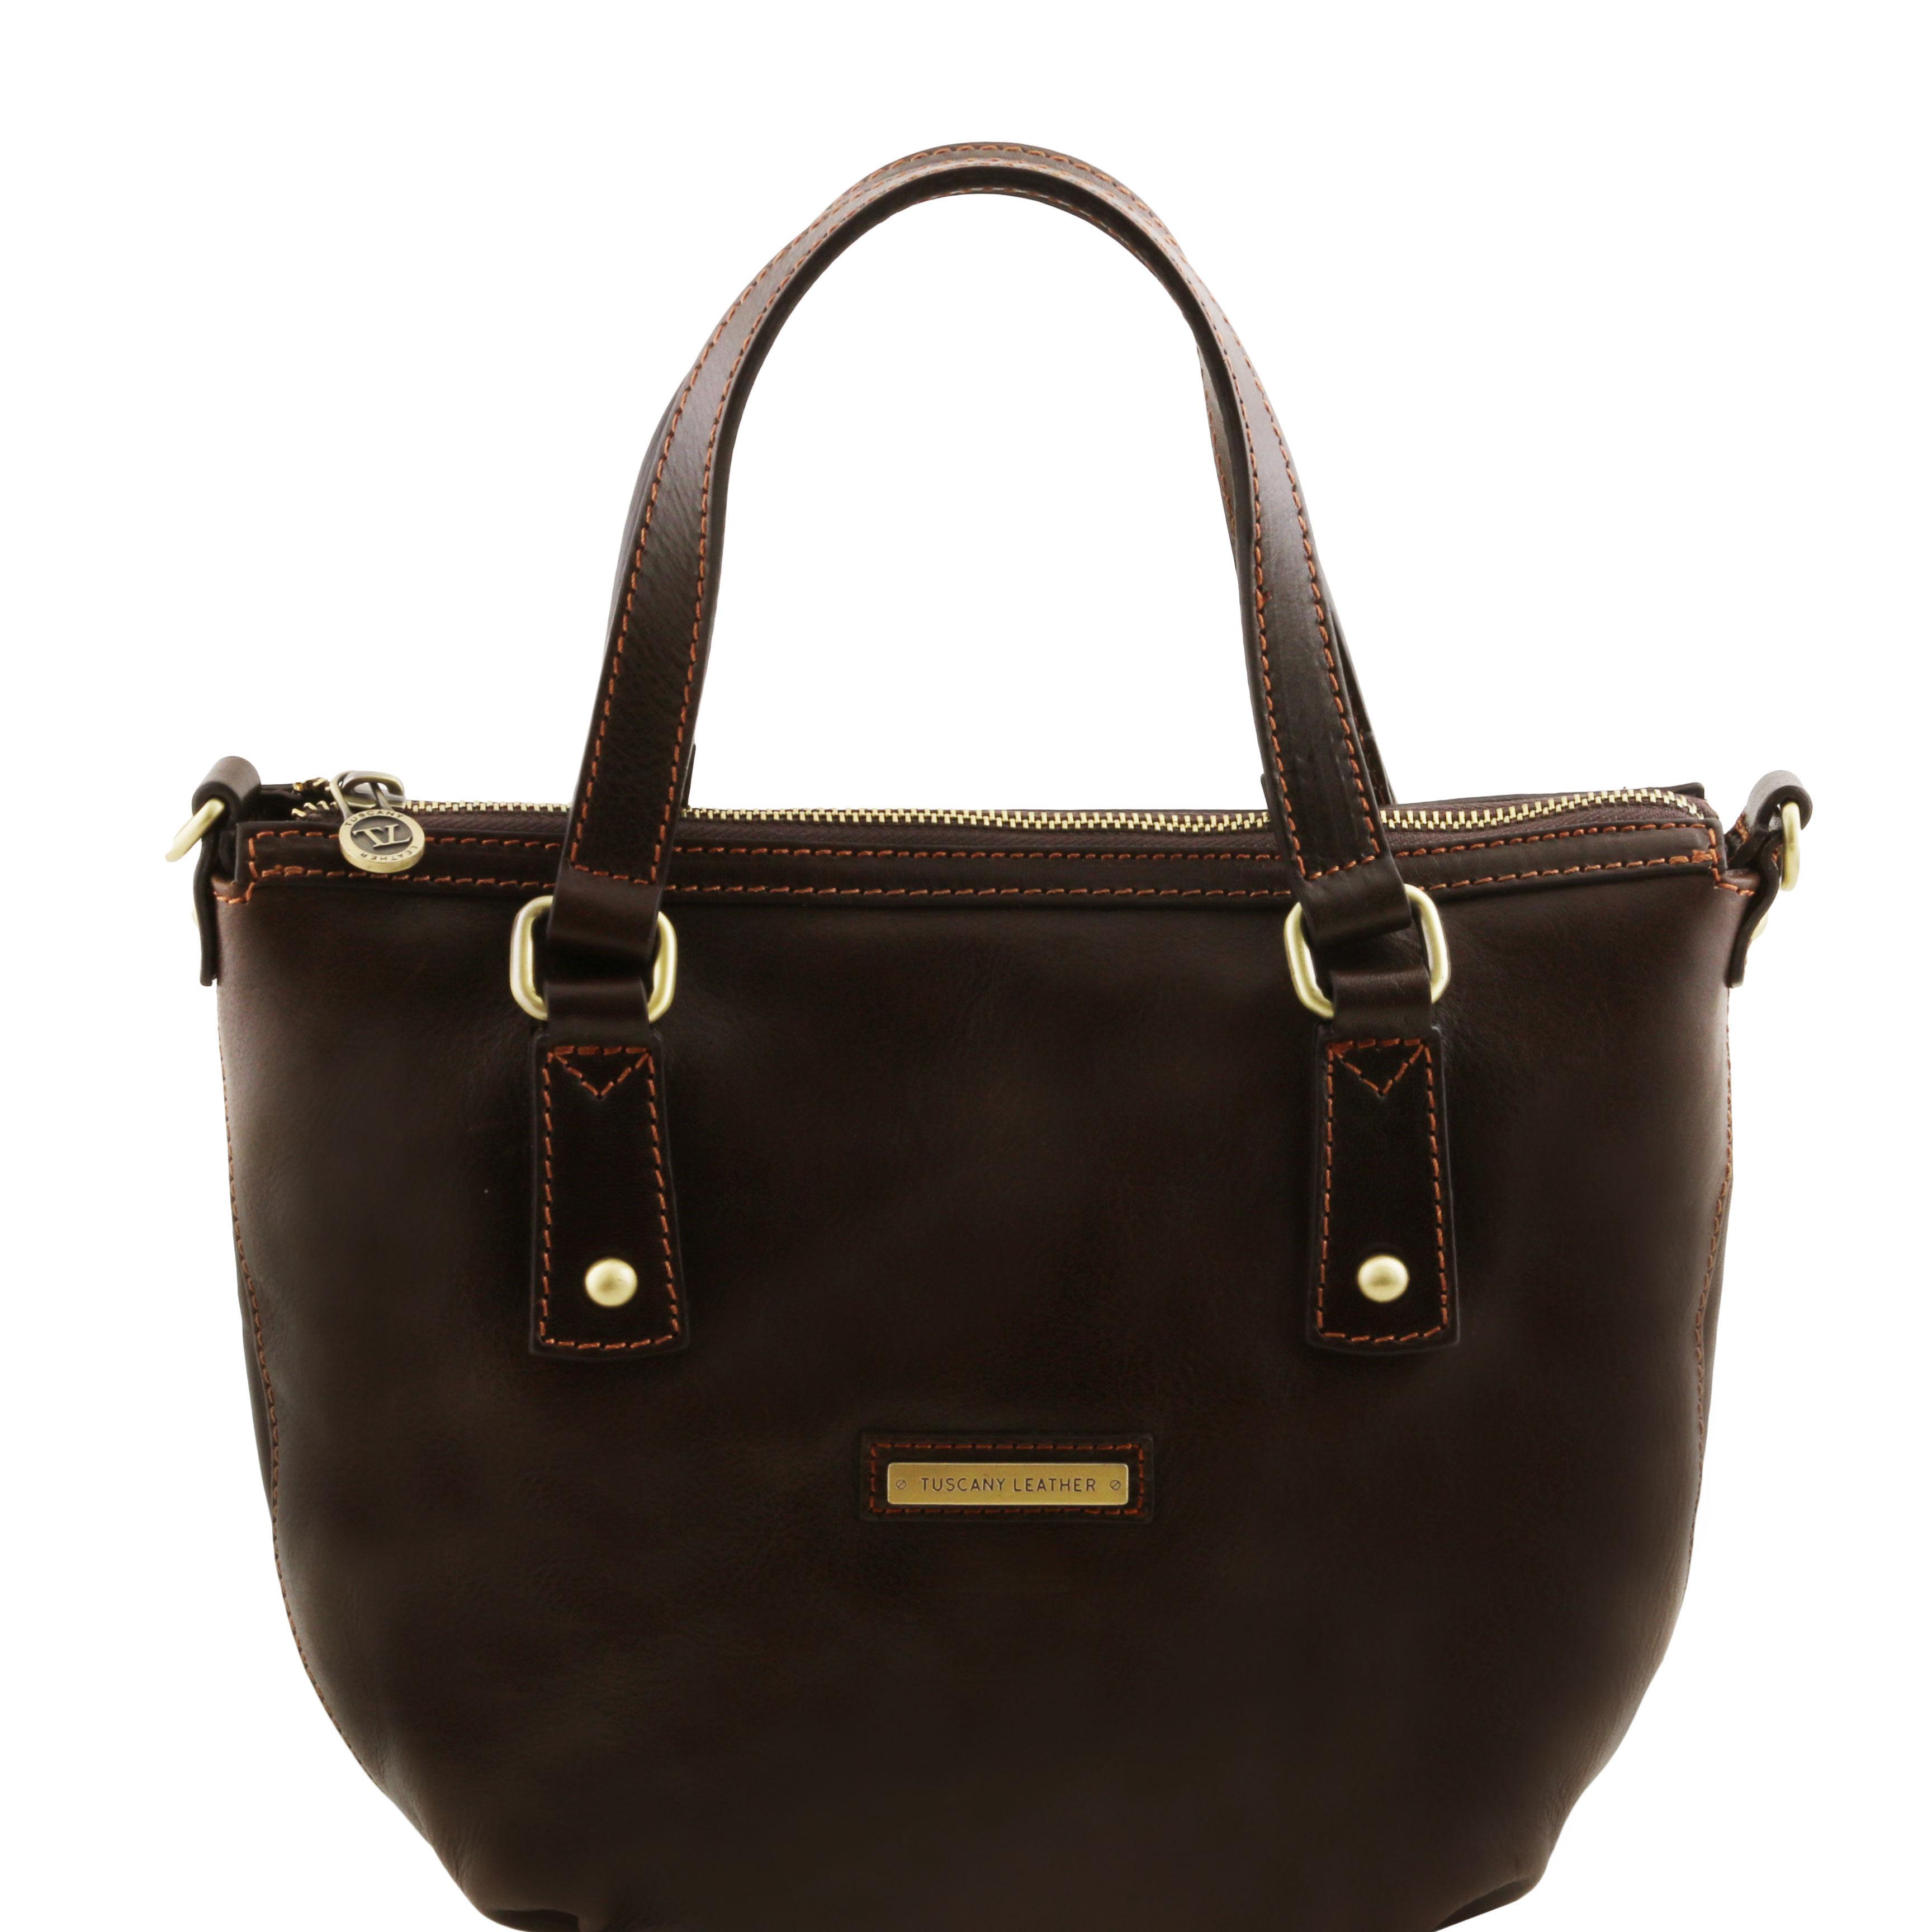 geanta de mana shopper Tuscany Leather din piele maro inchis Olga